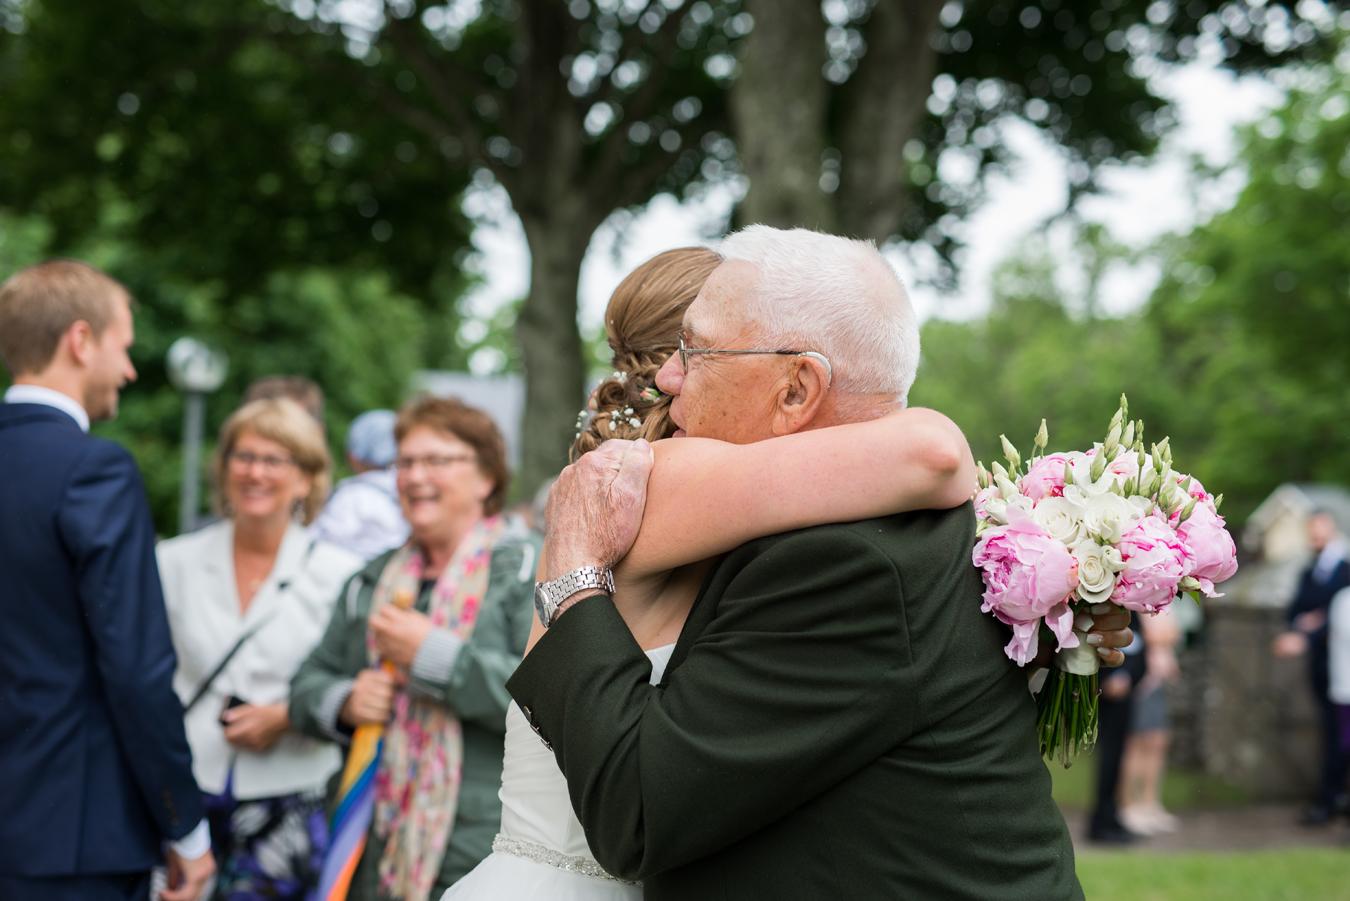 013-bröllopsfotograf-folhammar-gotland-neas-fotografi.jpg